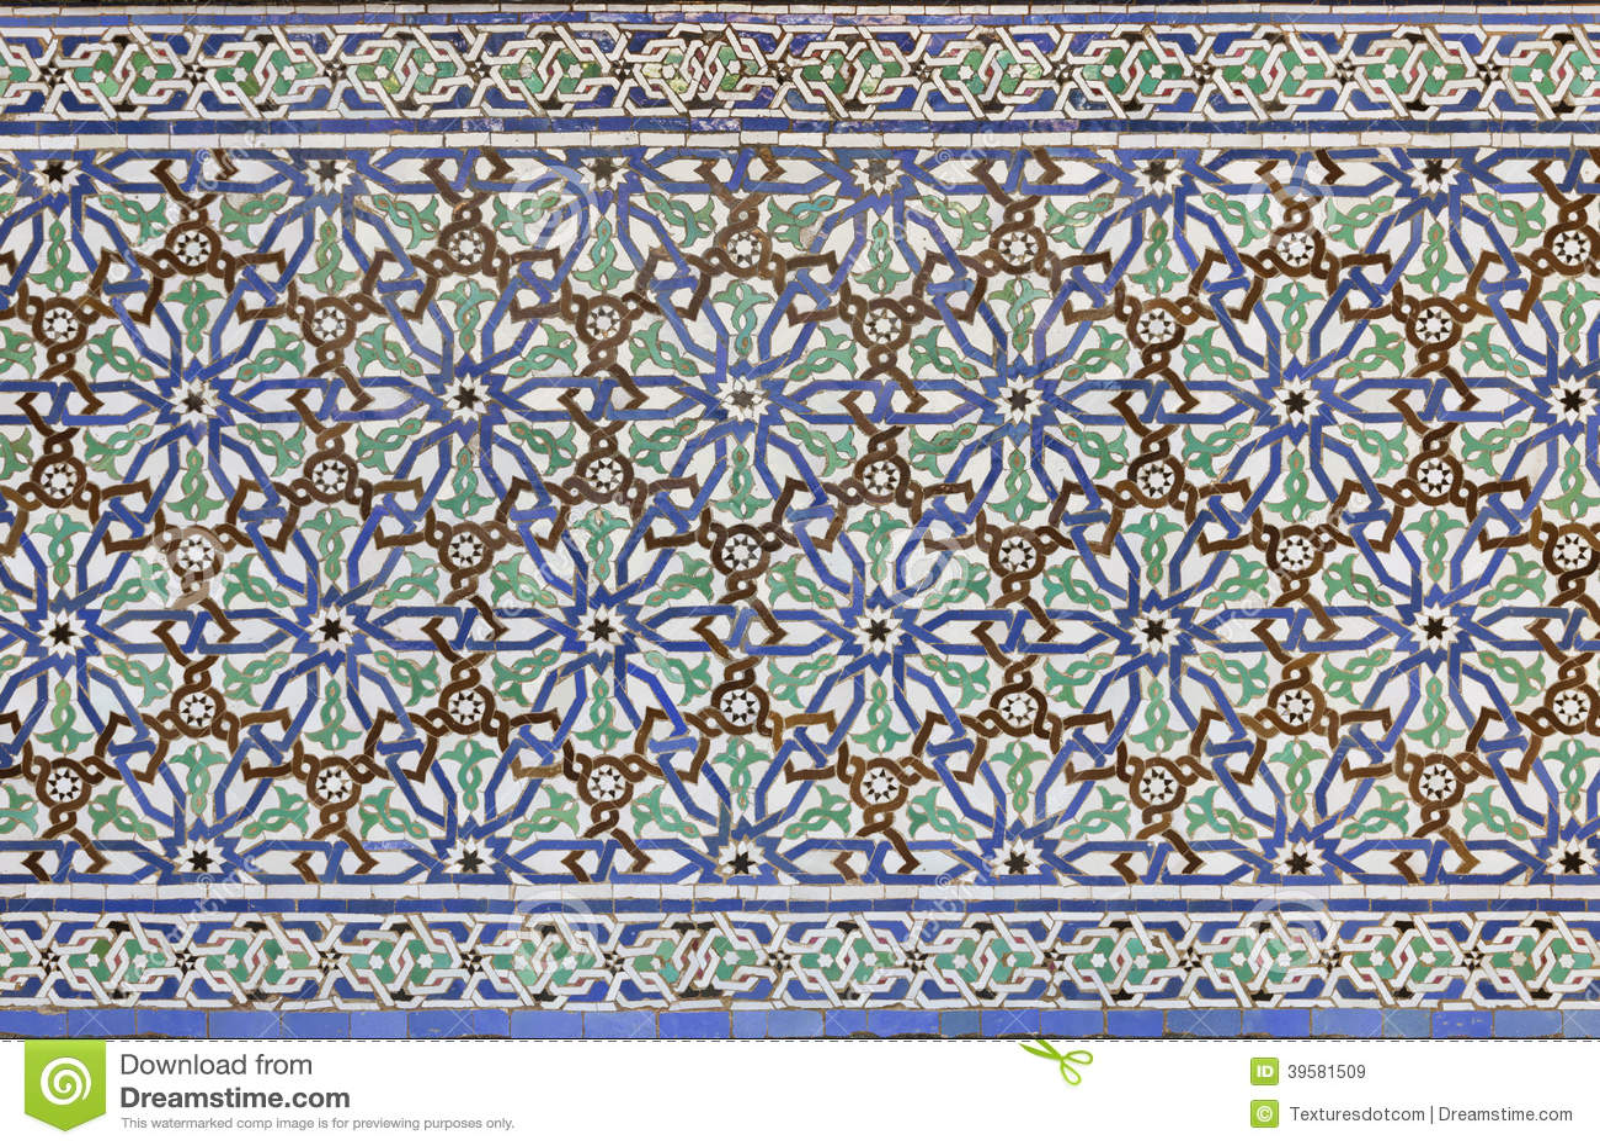 Moroccan Zellige Tile Stock Image Image Of Casablanca